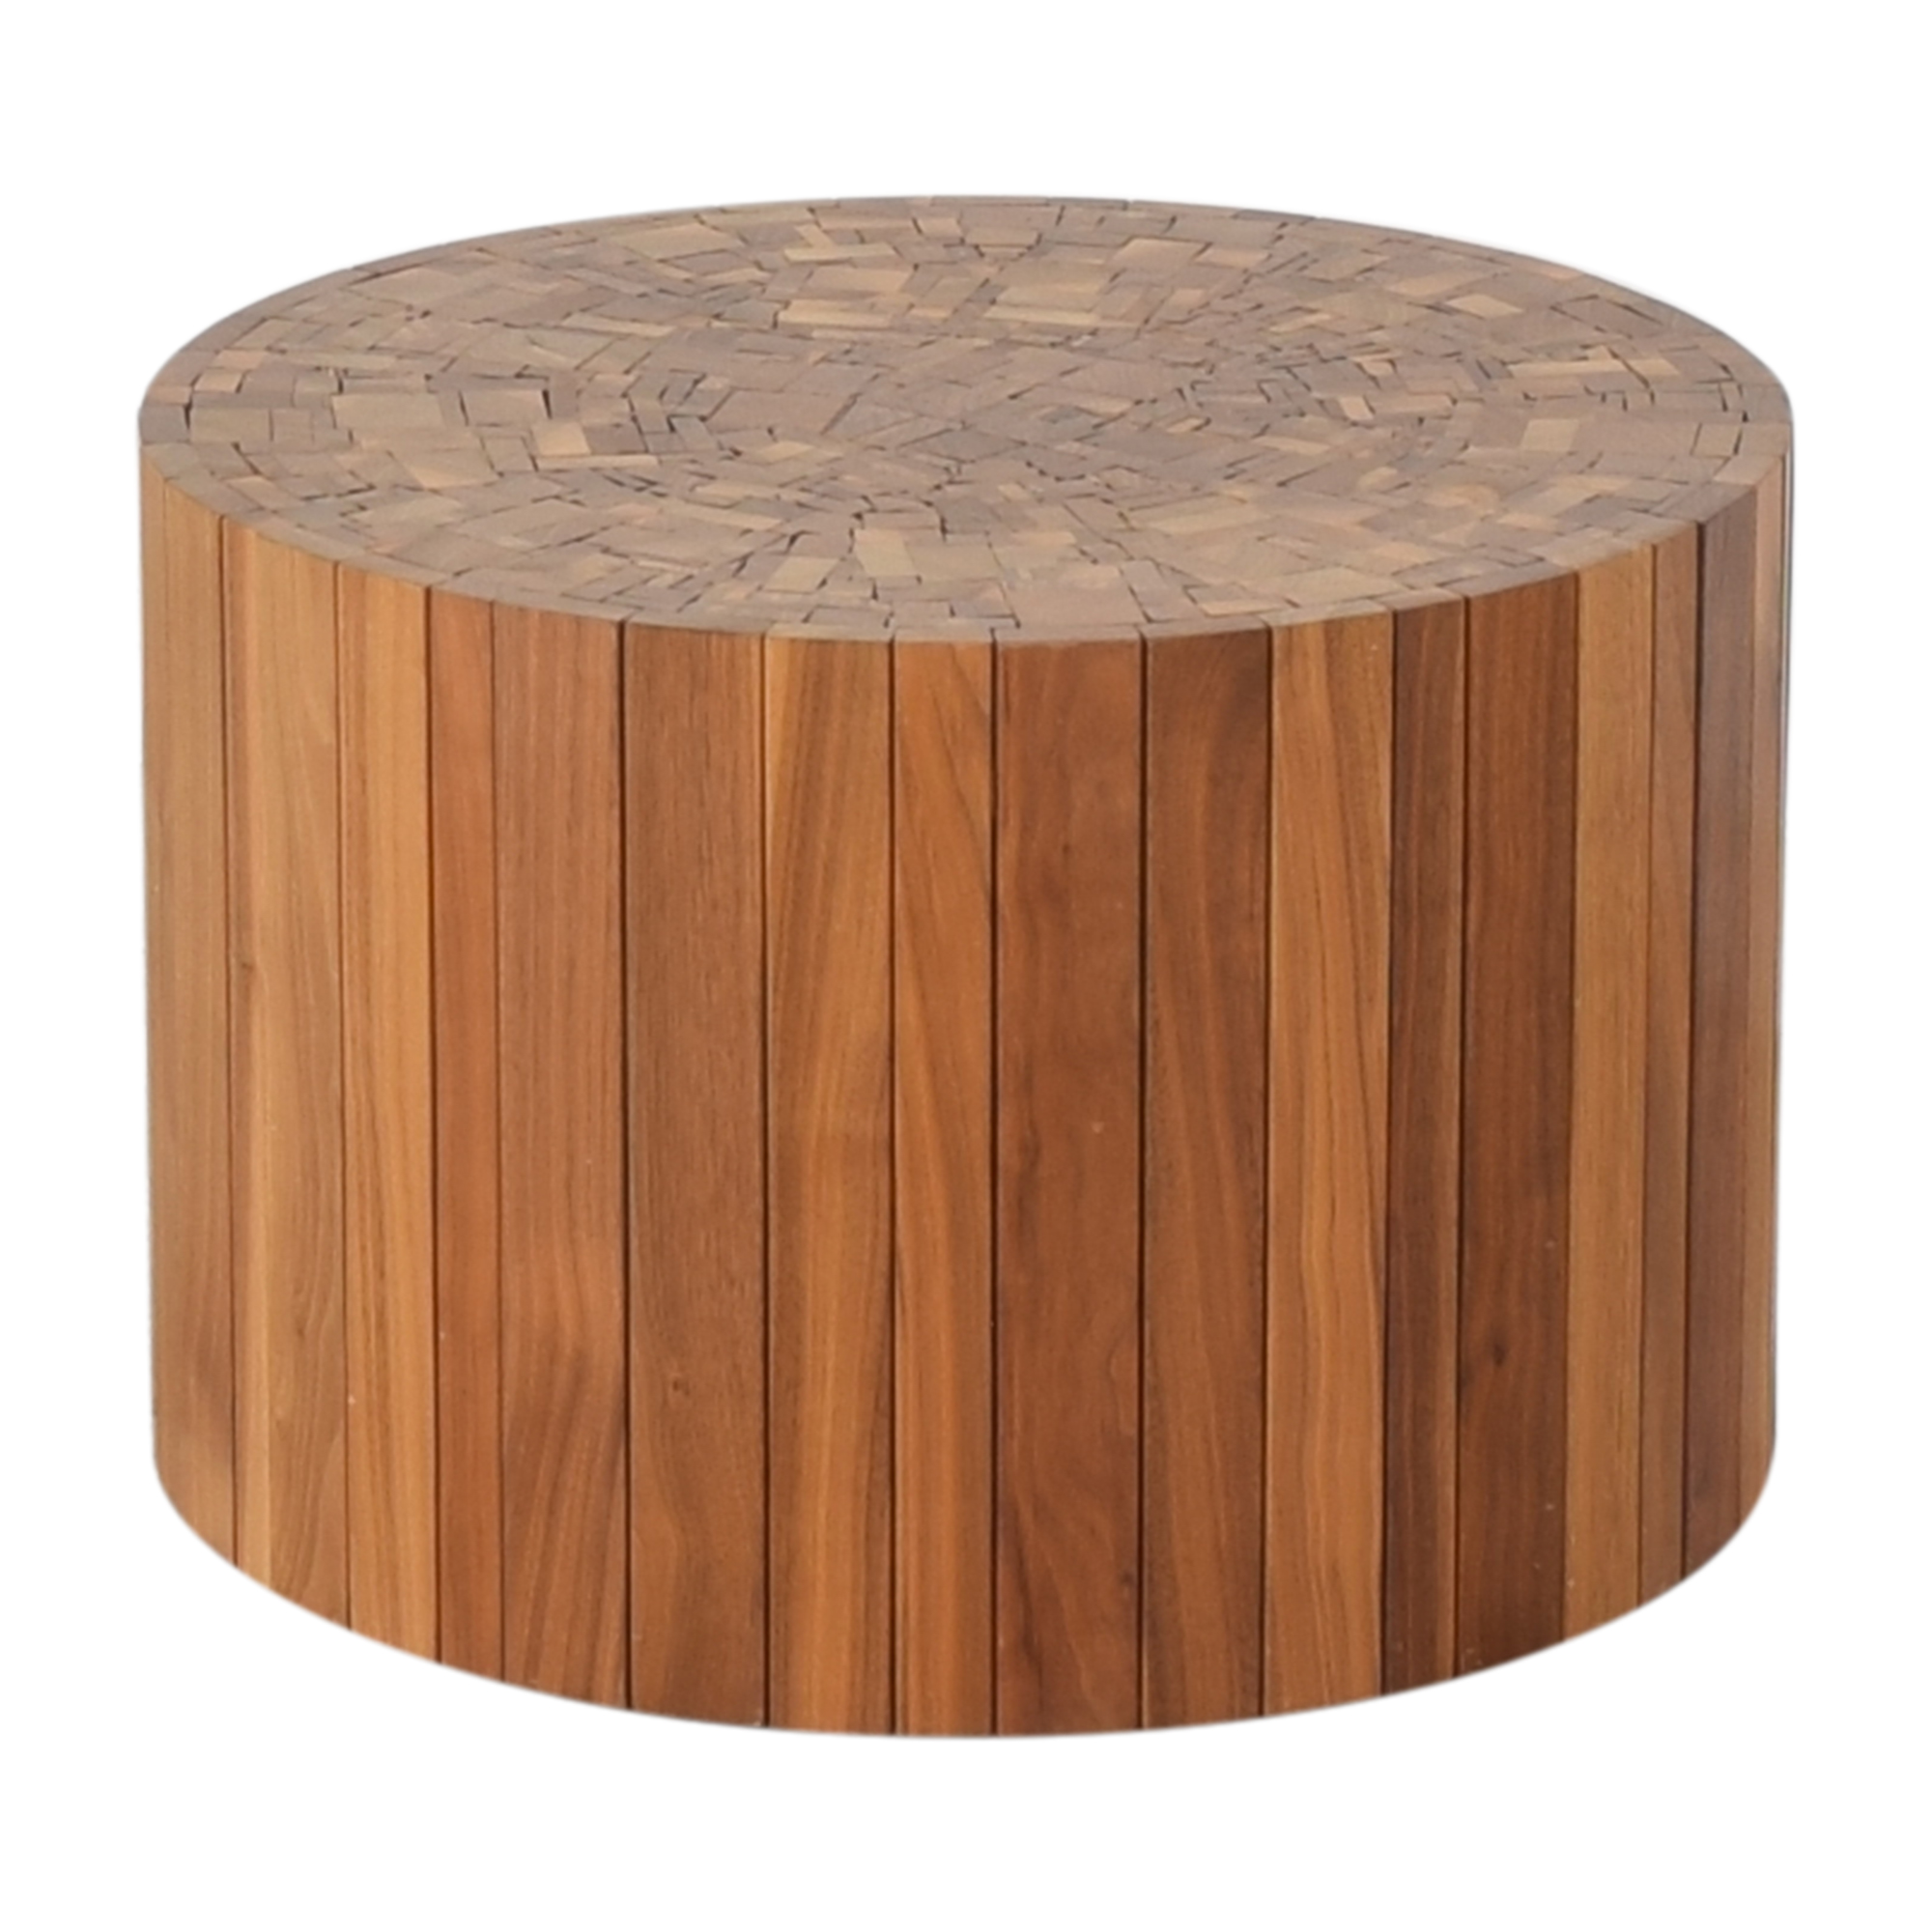 Uhuru Design Uhuru Design Stoolen Coffee Table ma